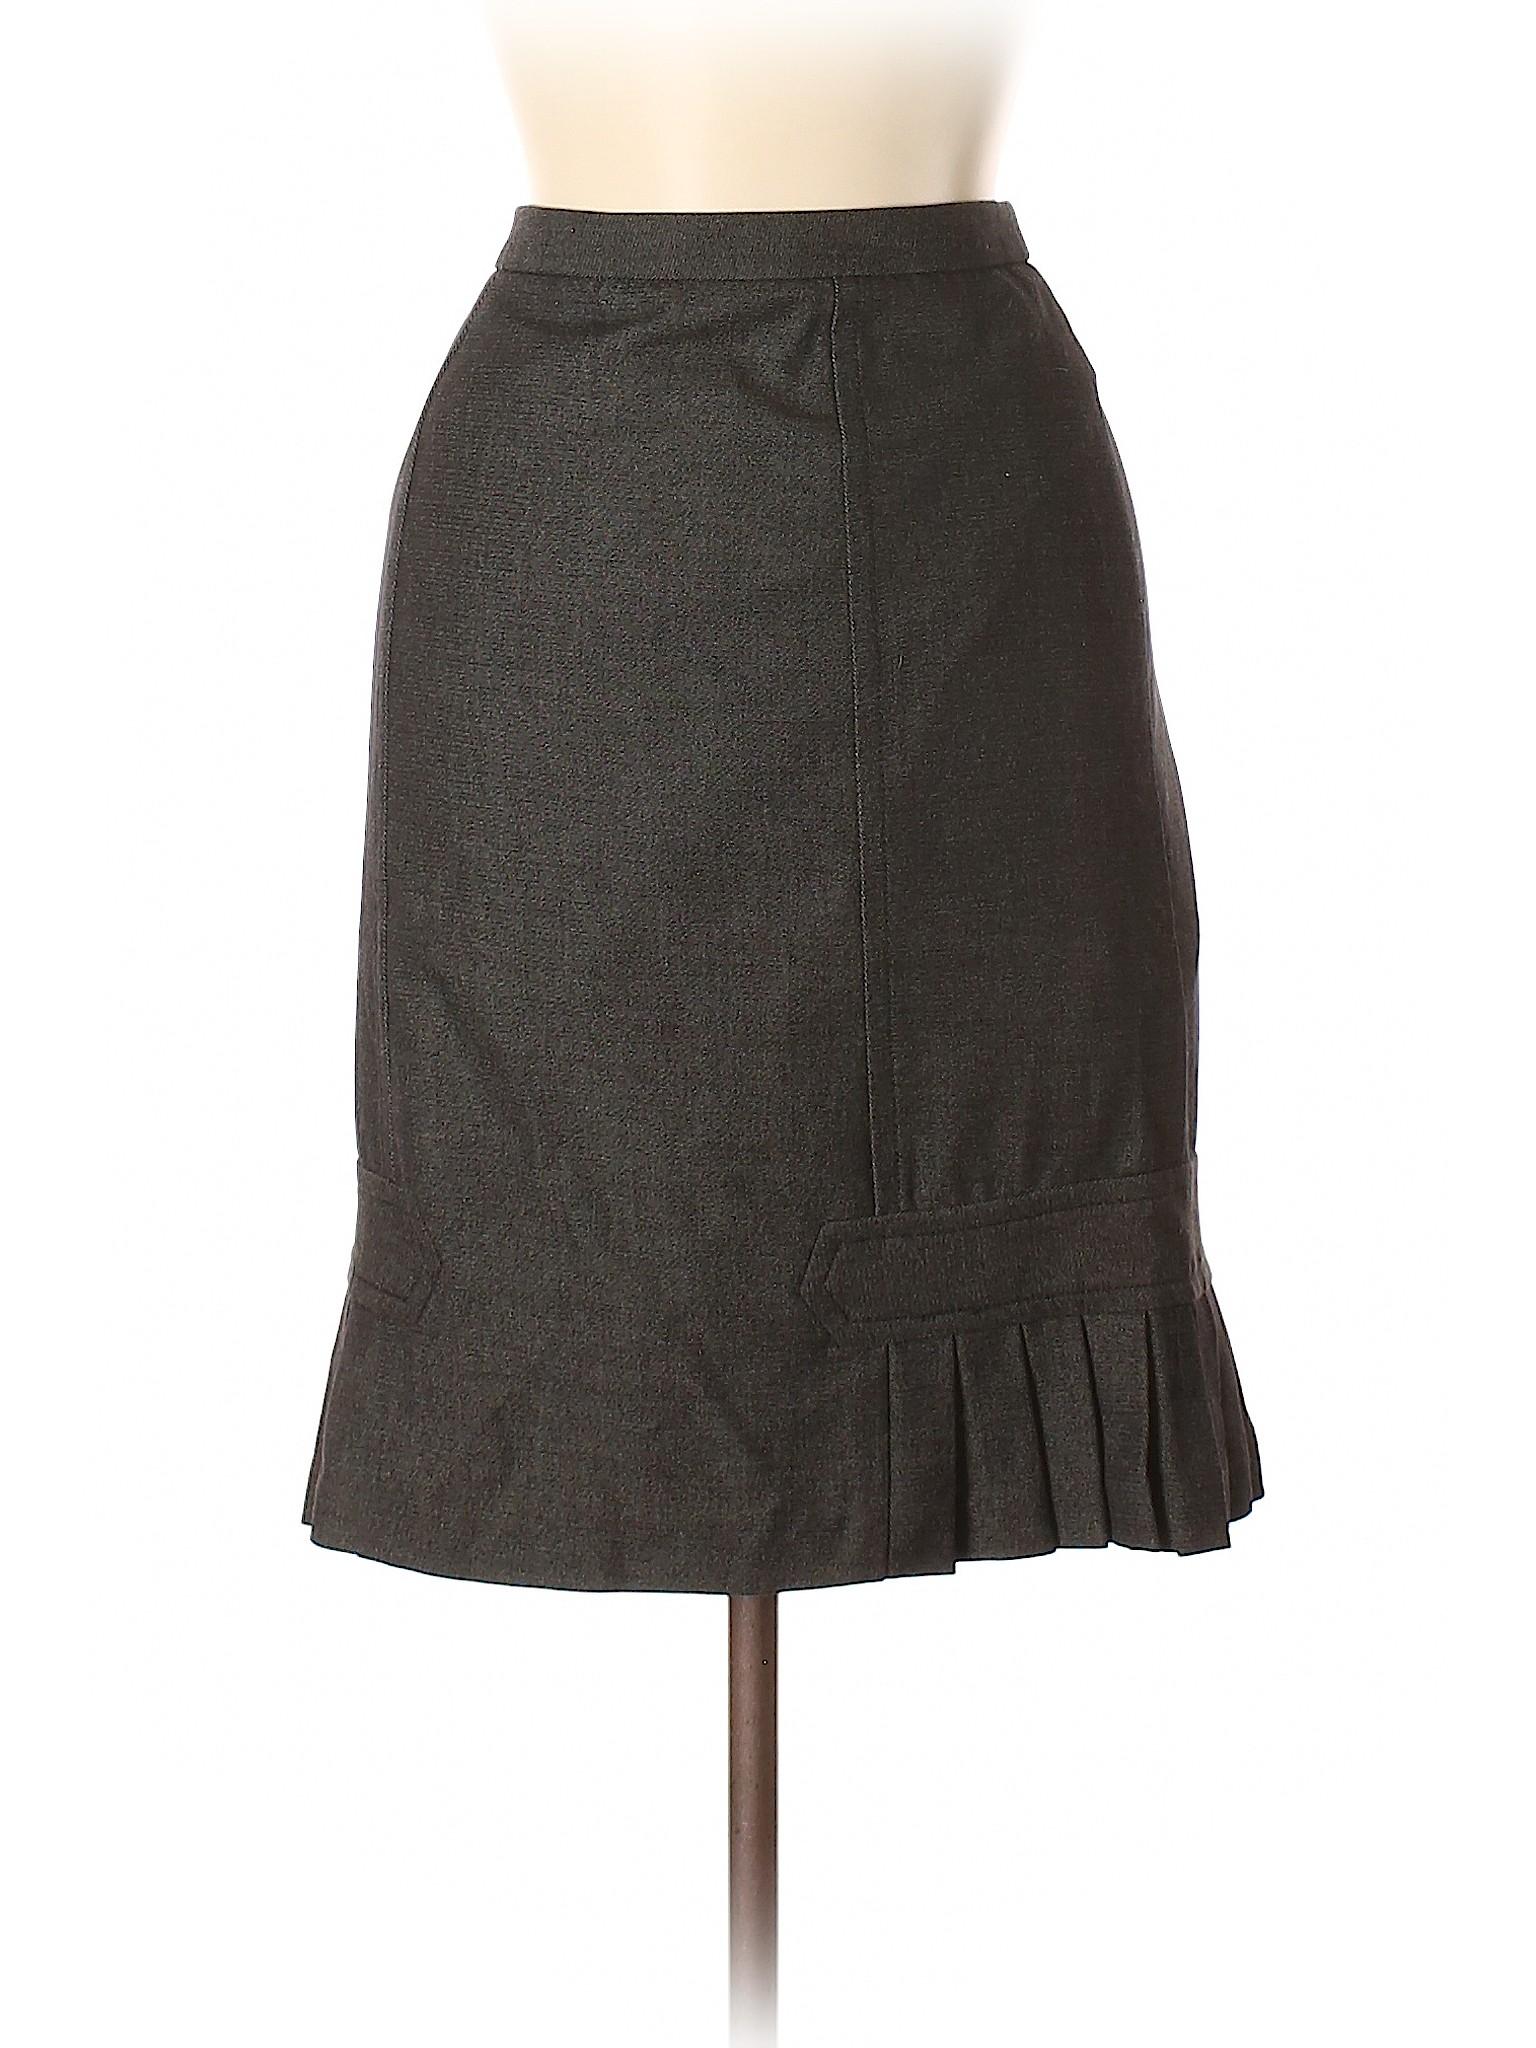 Boutique Skirt Boutique Studio Max Max Casual qXRxOwXZ